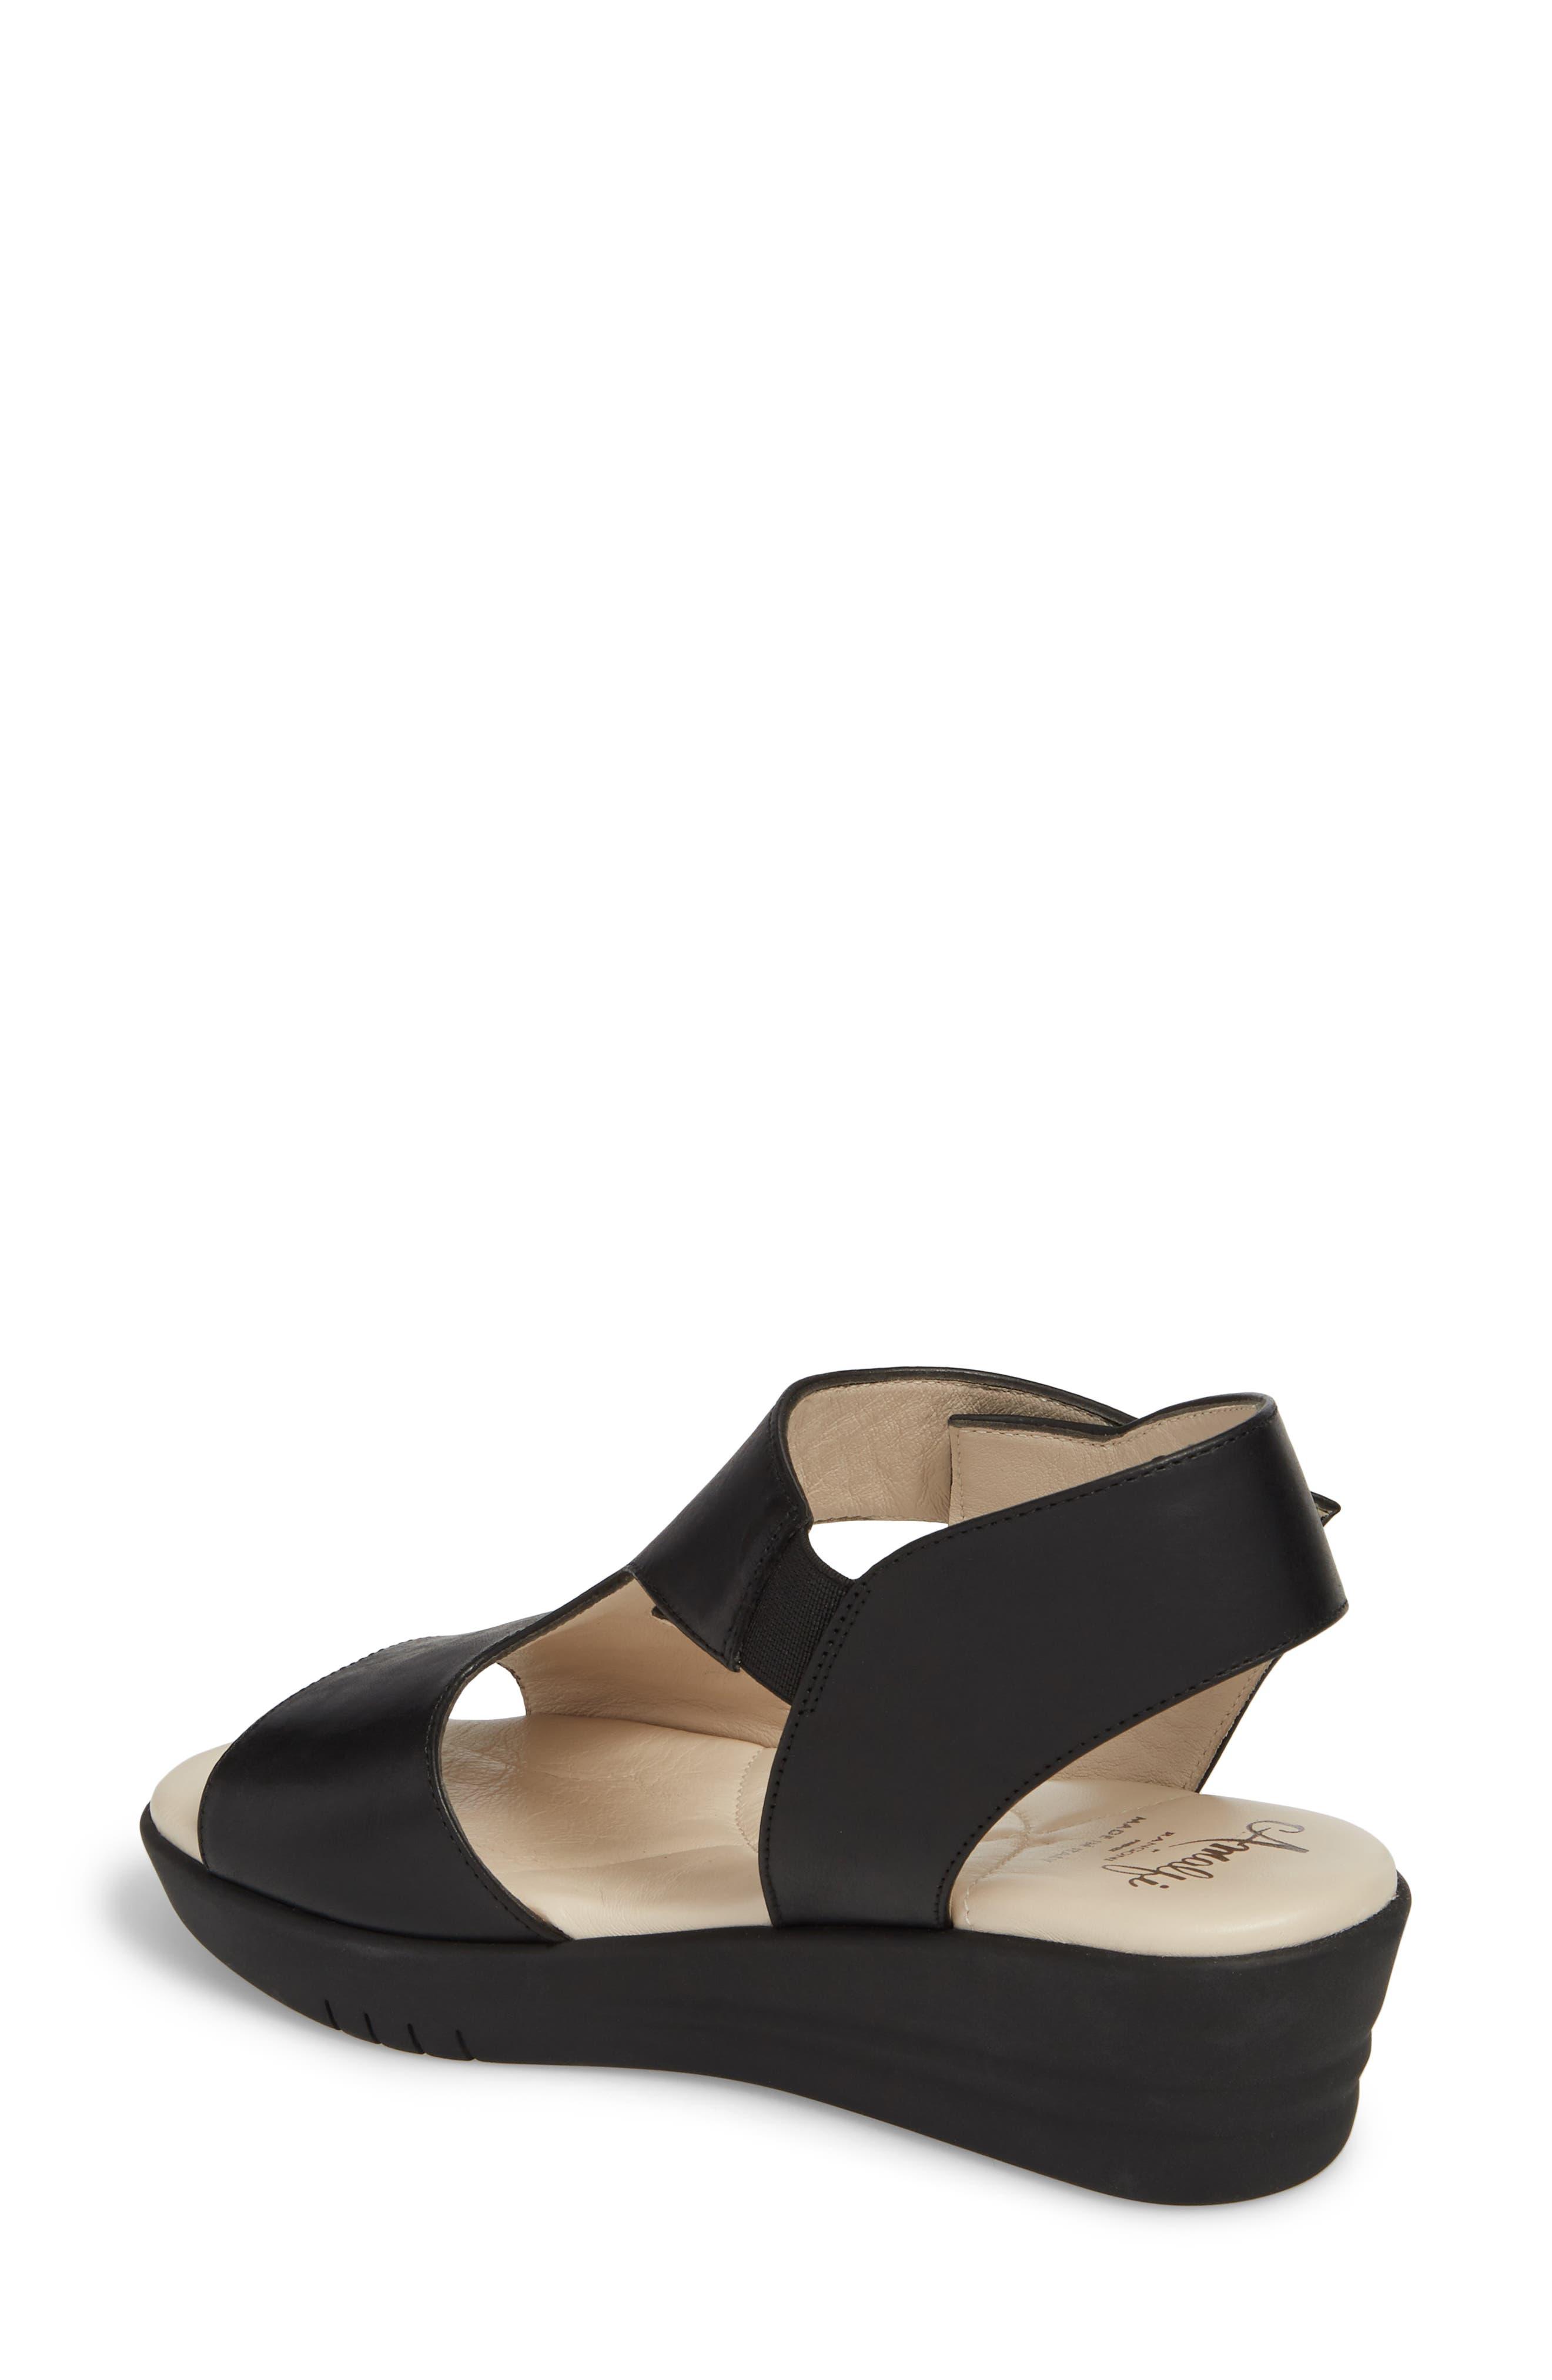 Gabby Platform Sandal,                             Alternate thumbnail 2, color,                             BLACK LEATHER